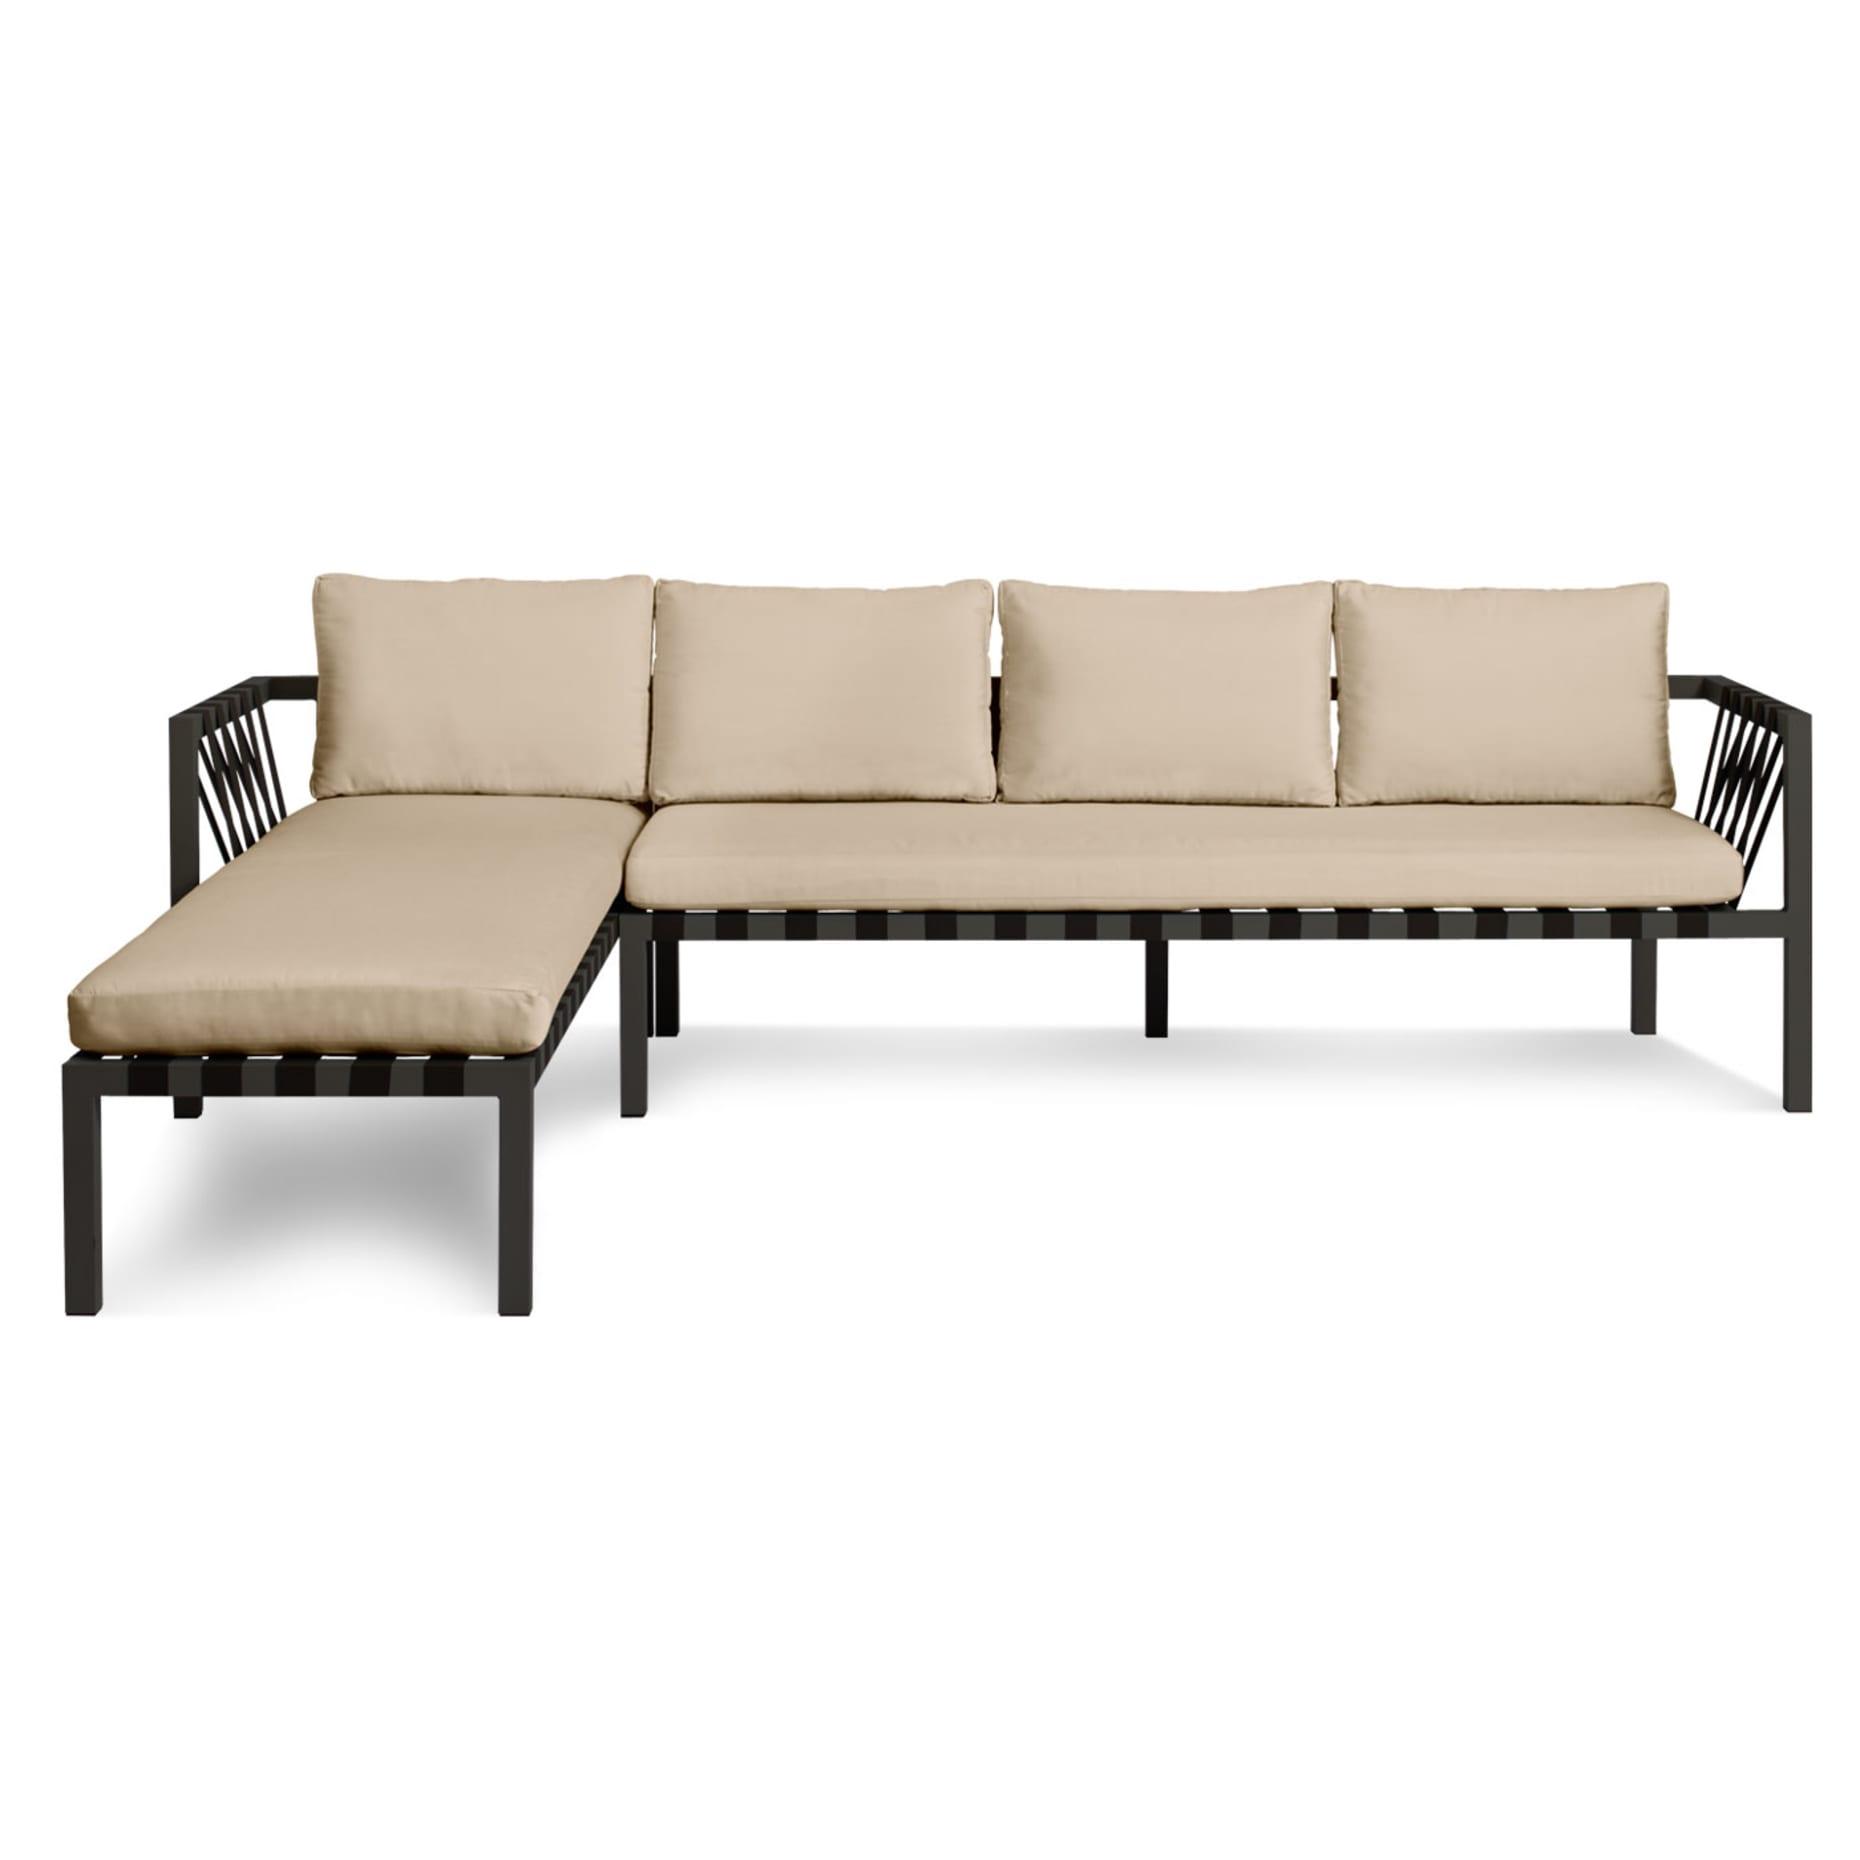 ji1 lfsect cb jibe left sectional sofa carbon sunbrella taupe 2